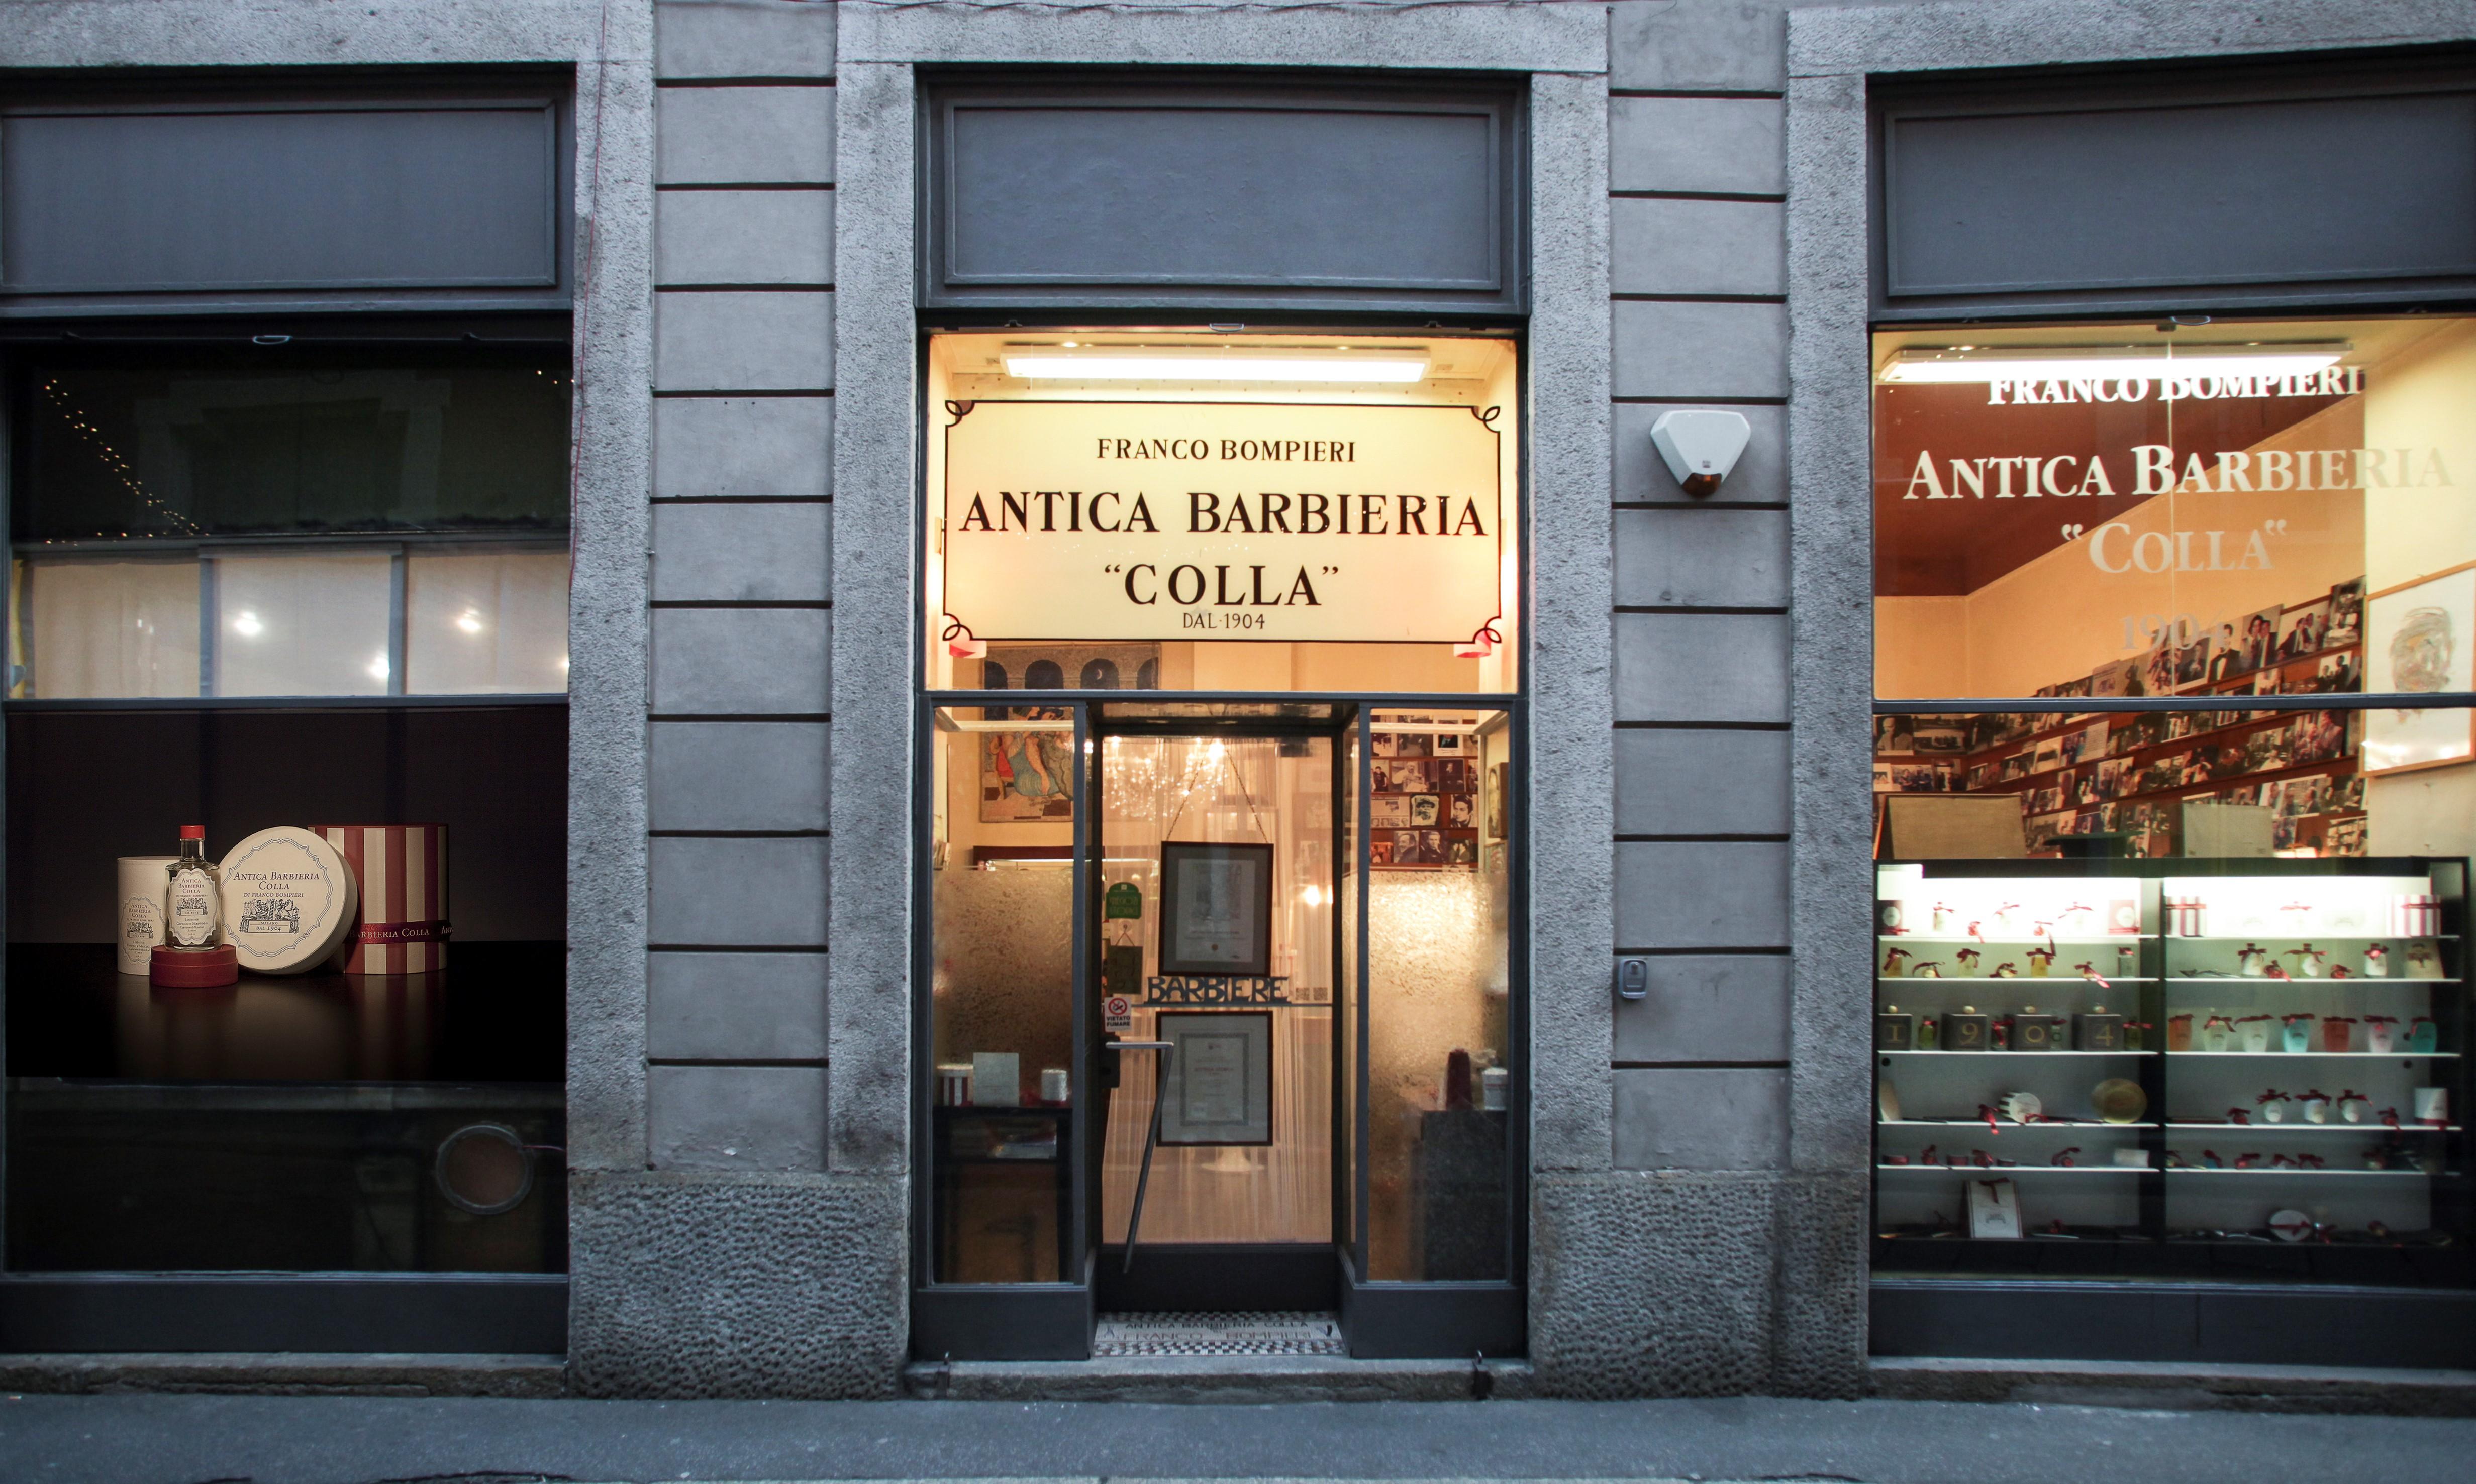 Antica Barbieria Colla|ミラノの理容店が手掛ける高級メンズグルーミングアイテム